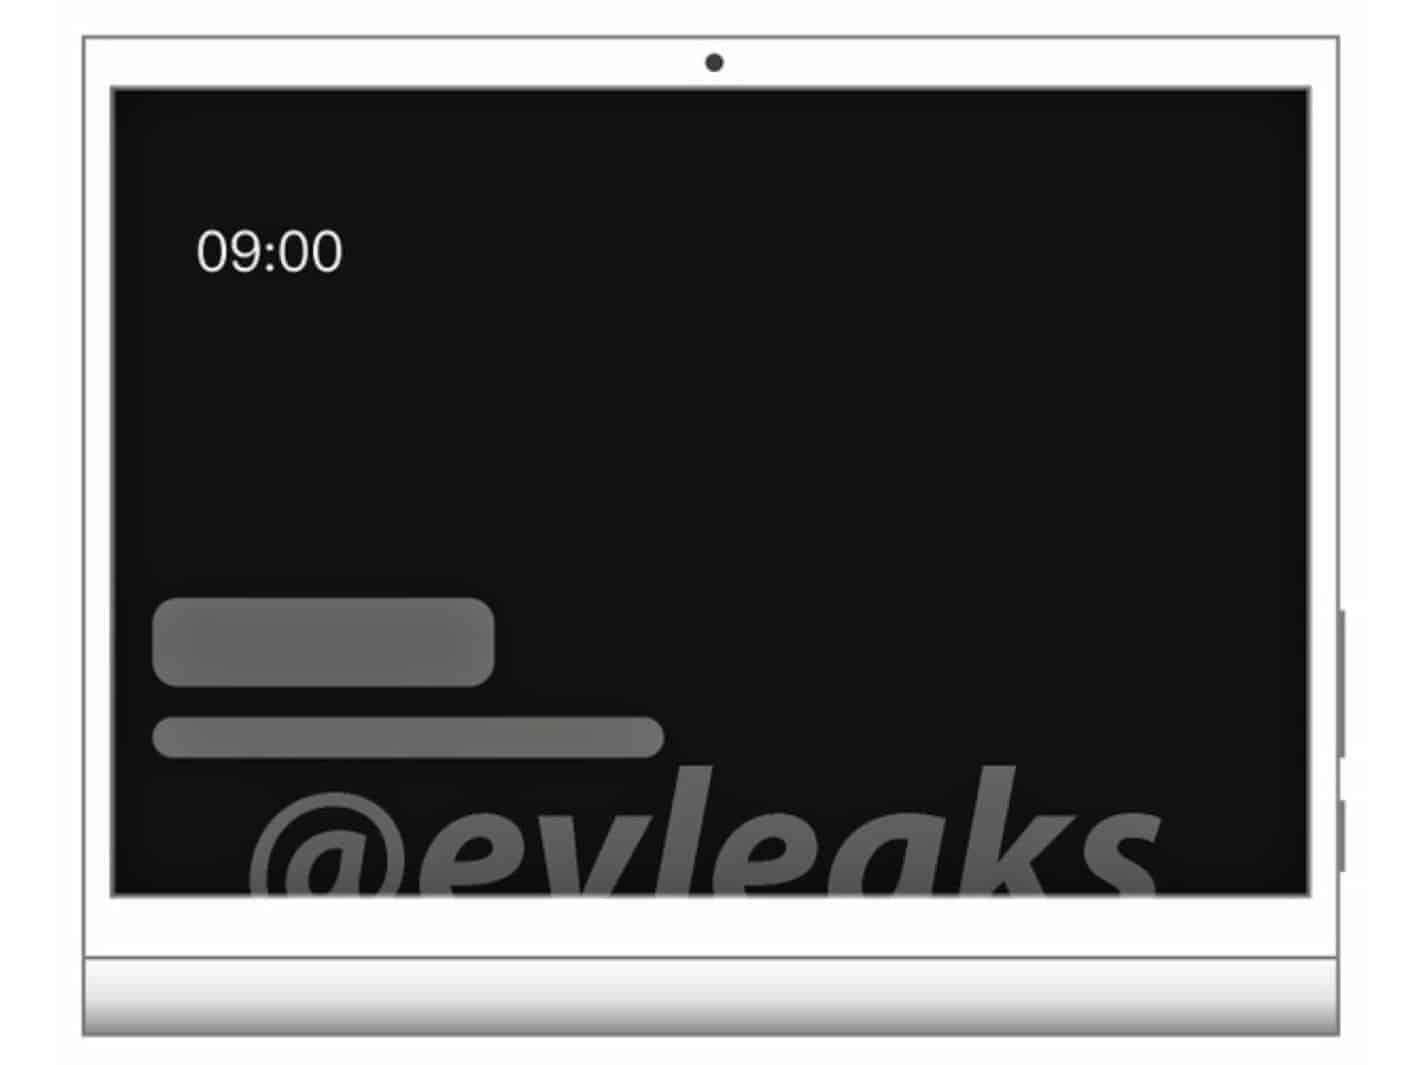 Lenovo Yoga X Wireframe from evan blass till kottman